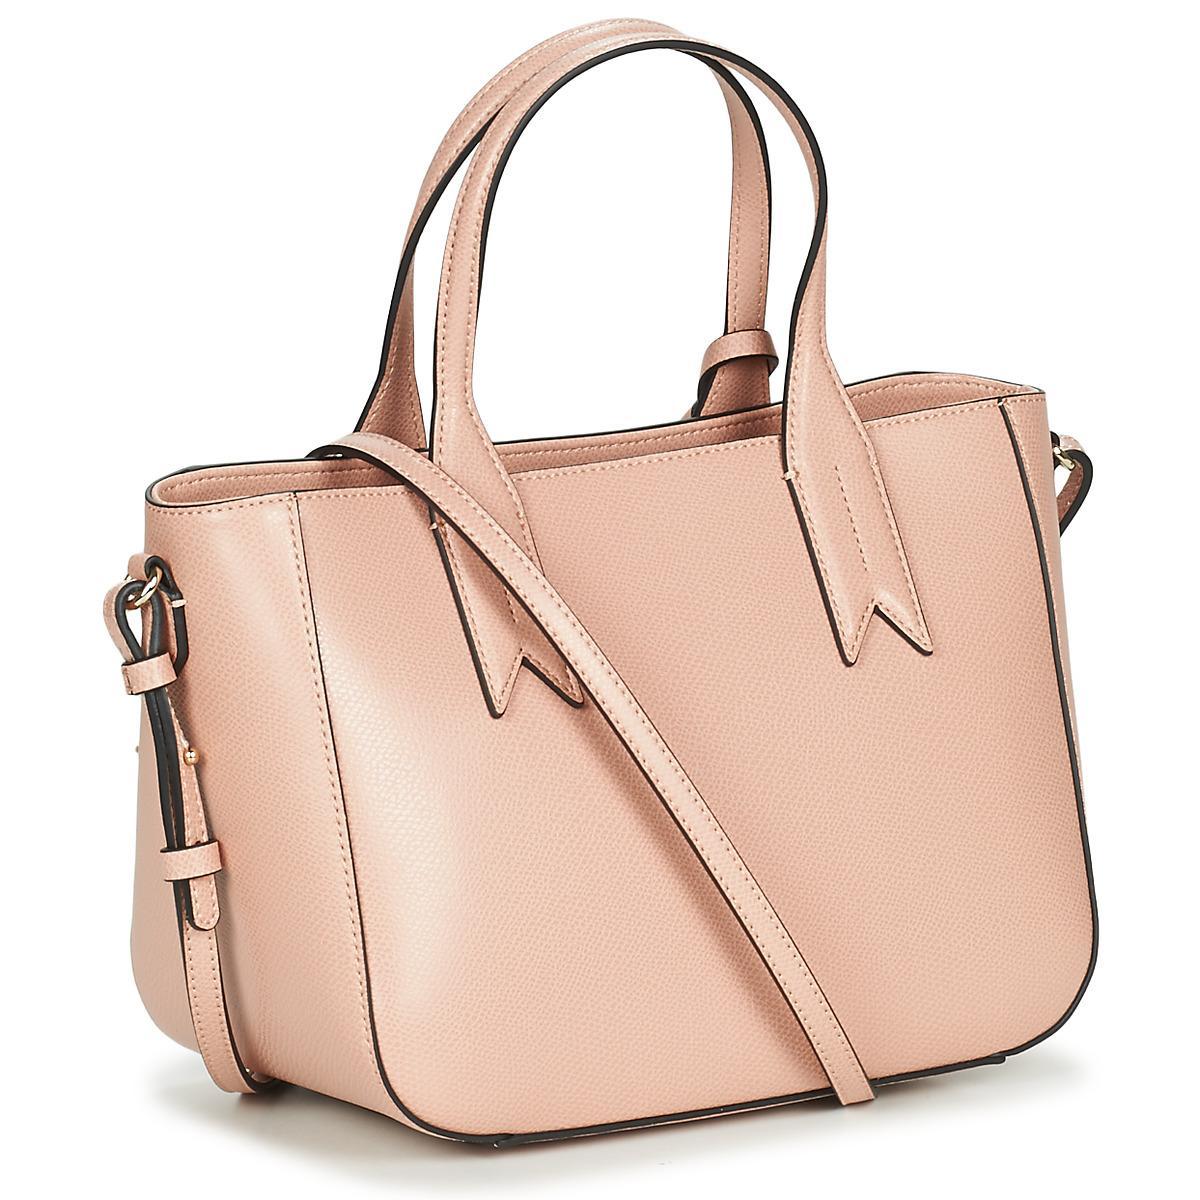 e68809dfaf1c Emporio Armani - Pink FRIDA SMALL TOTE femmes Sac à main en rose for Men -.  Afficher en plein écran